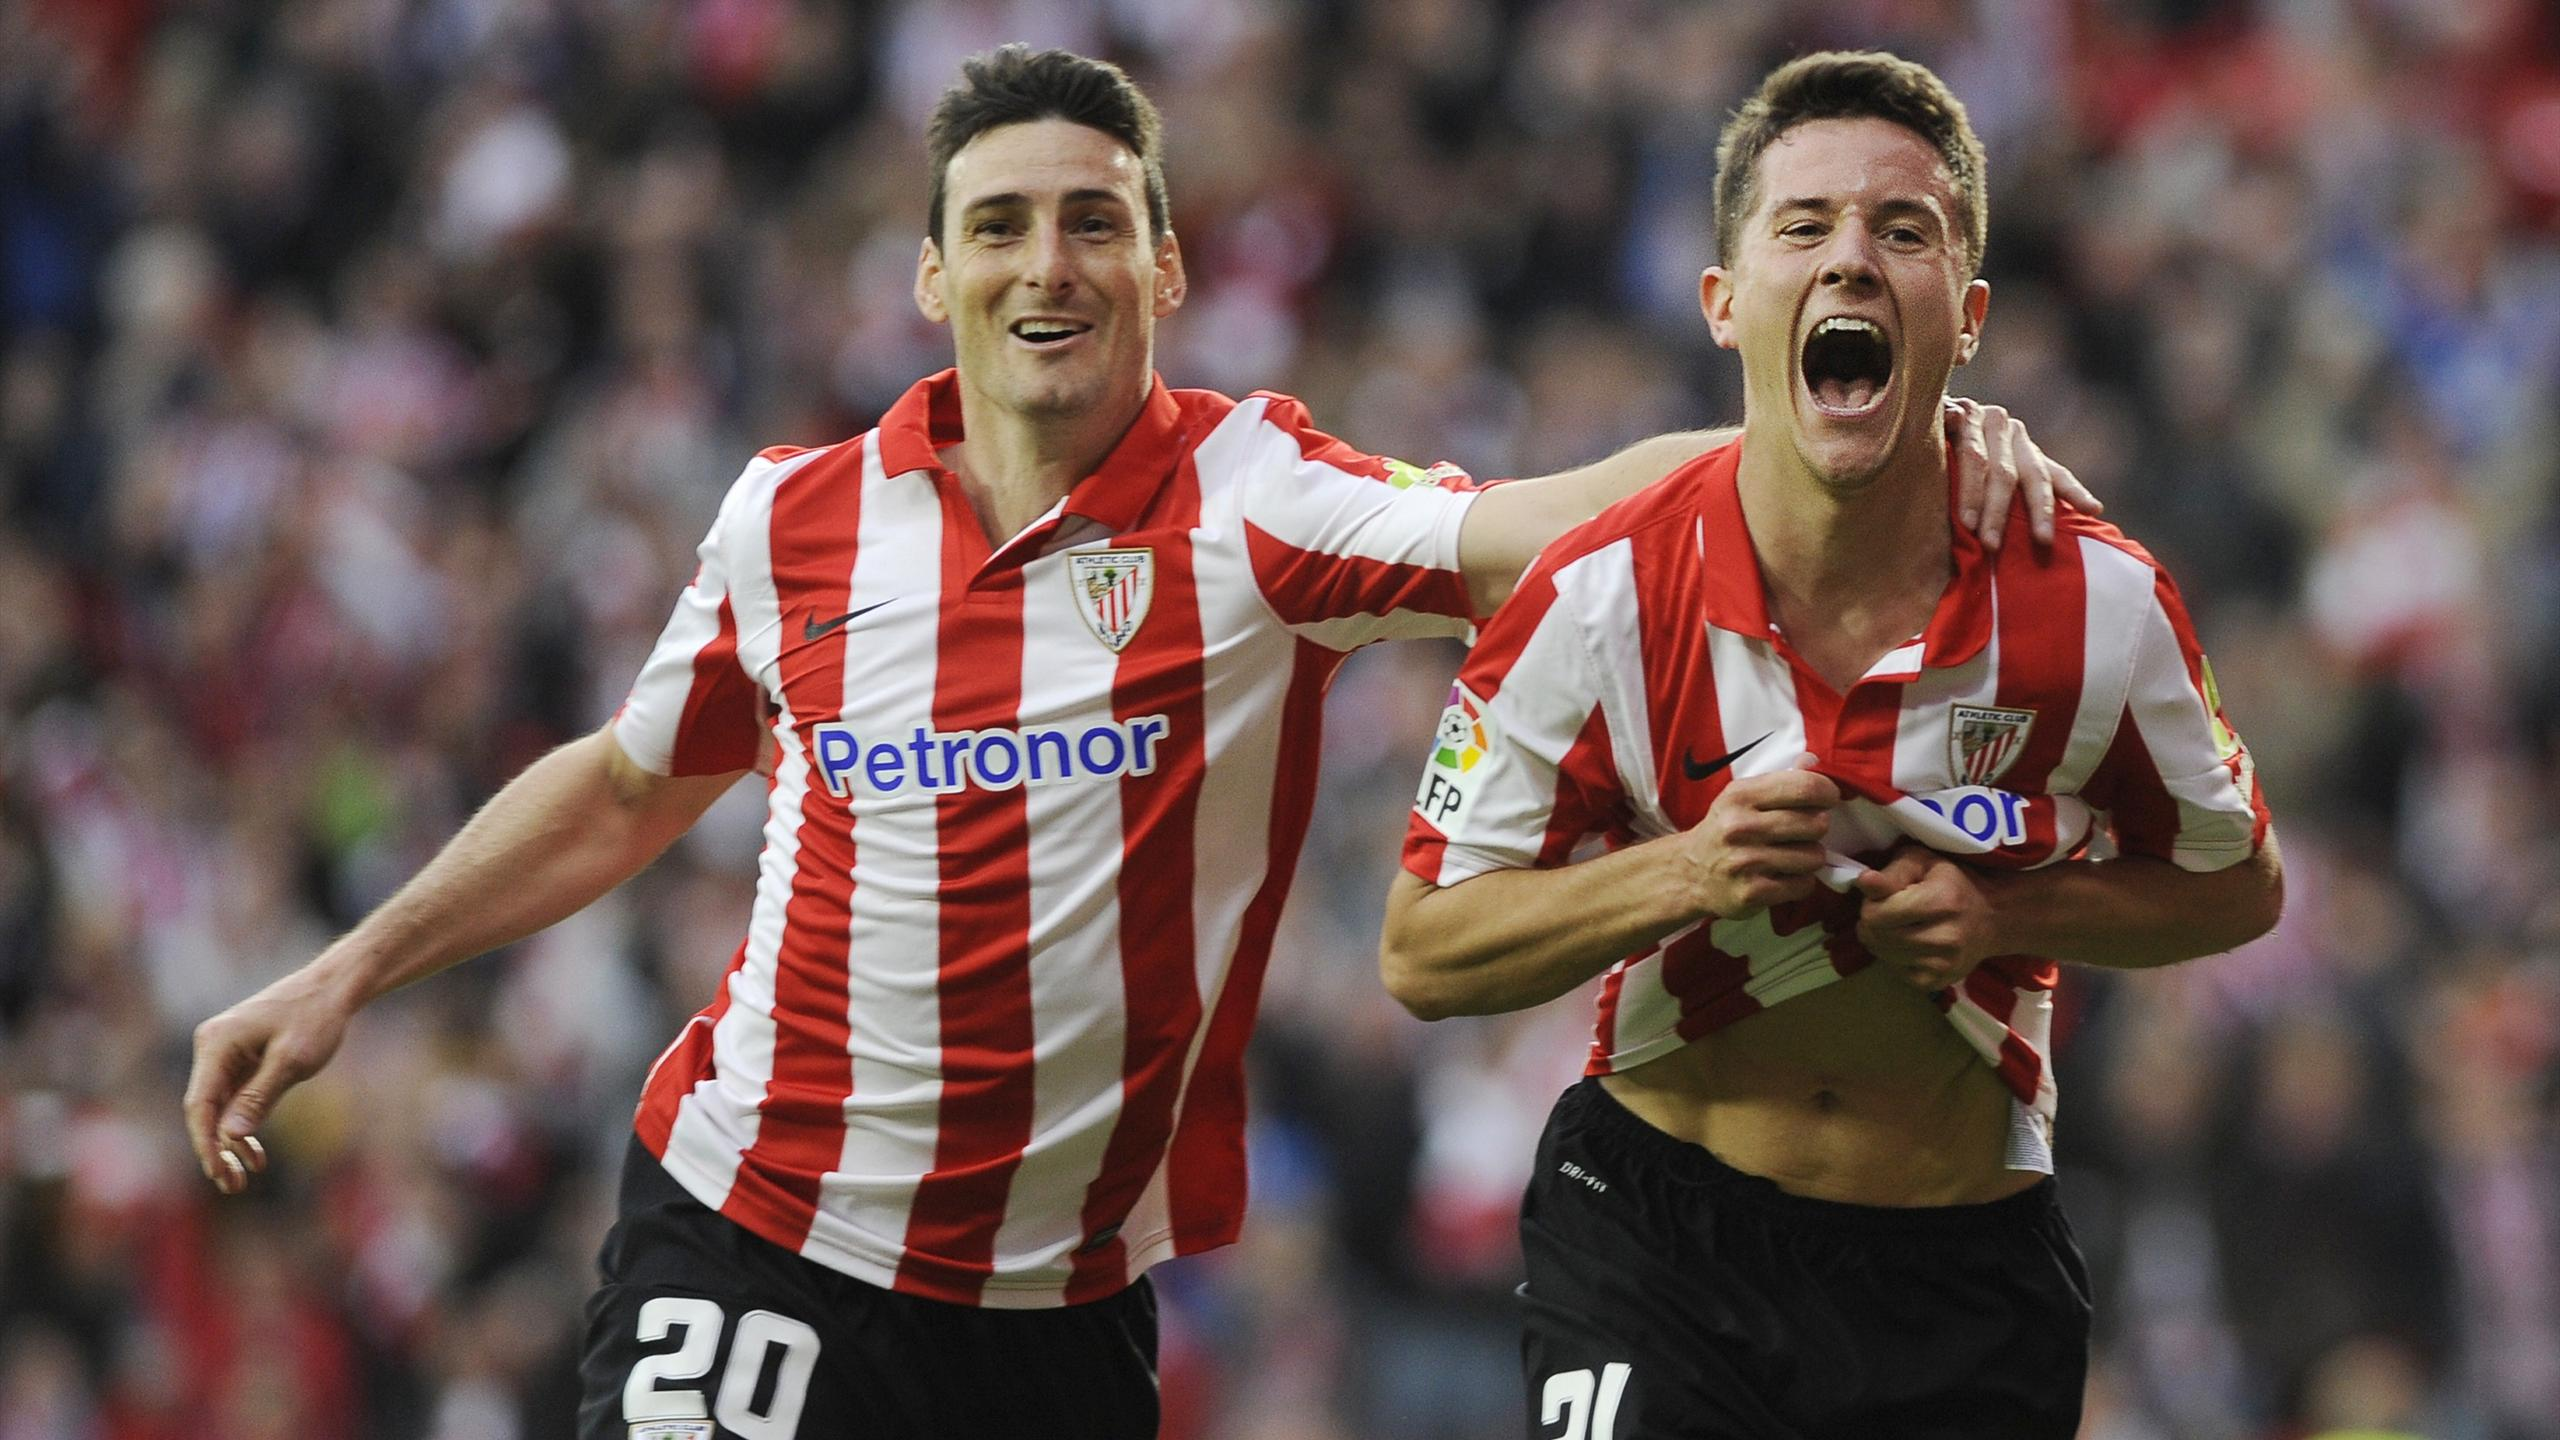 Match Athletic Bilbao vs Bate Borisov en direct streaming live